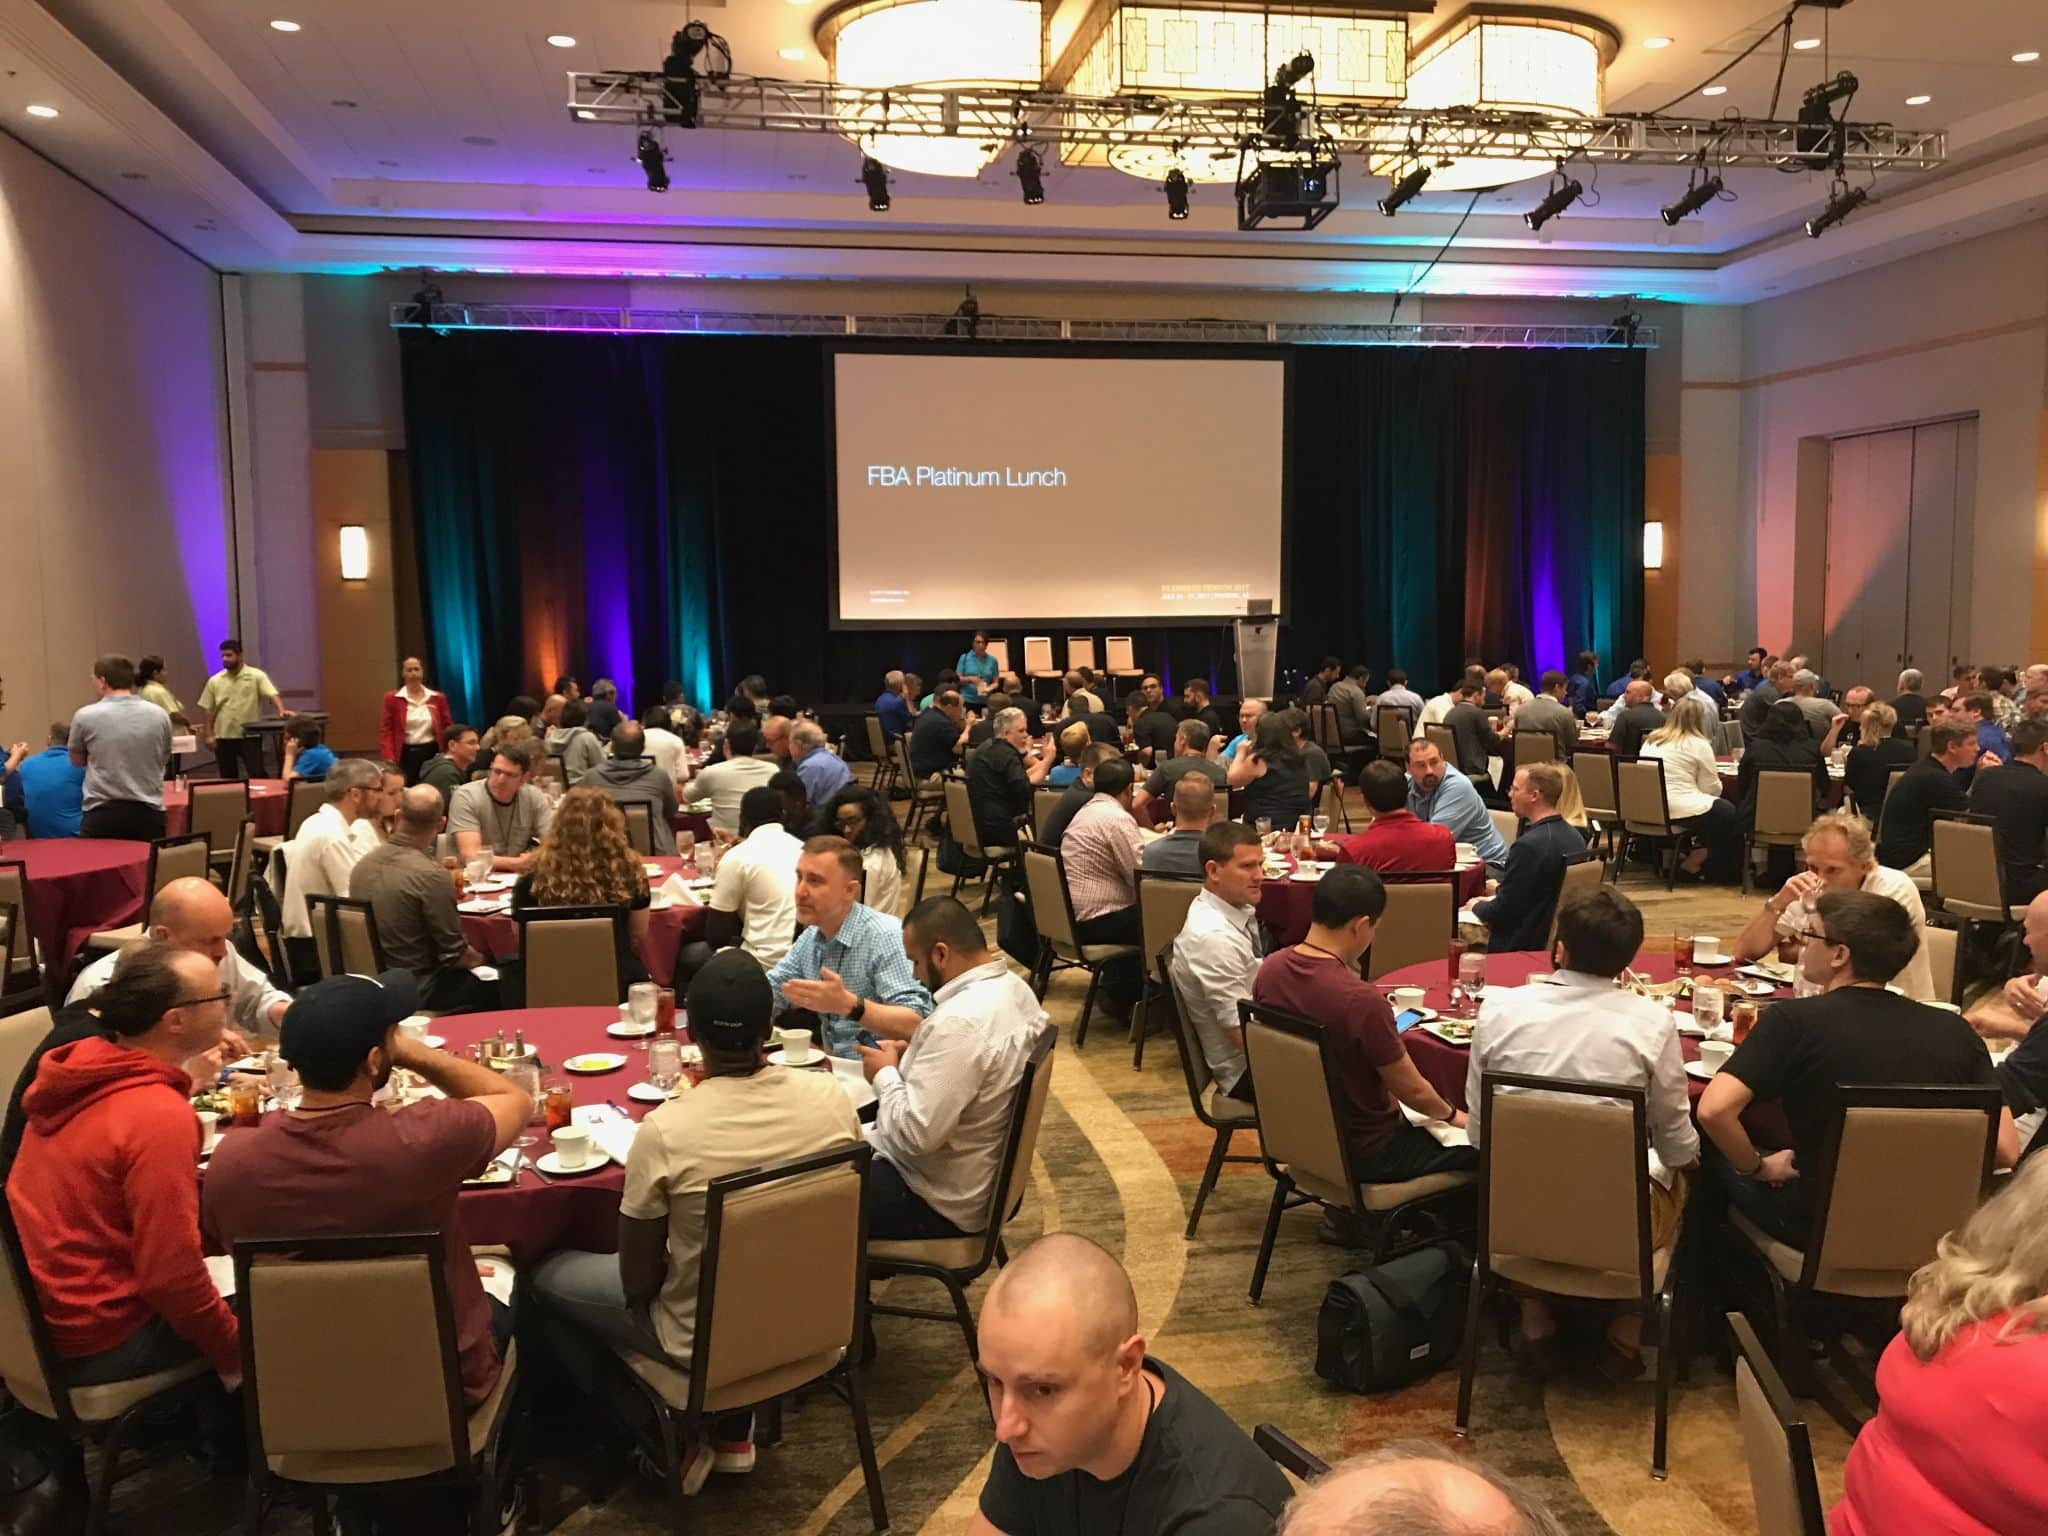 FileMaker DevCon 2017 Roundup 10